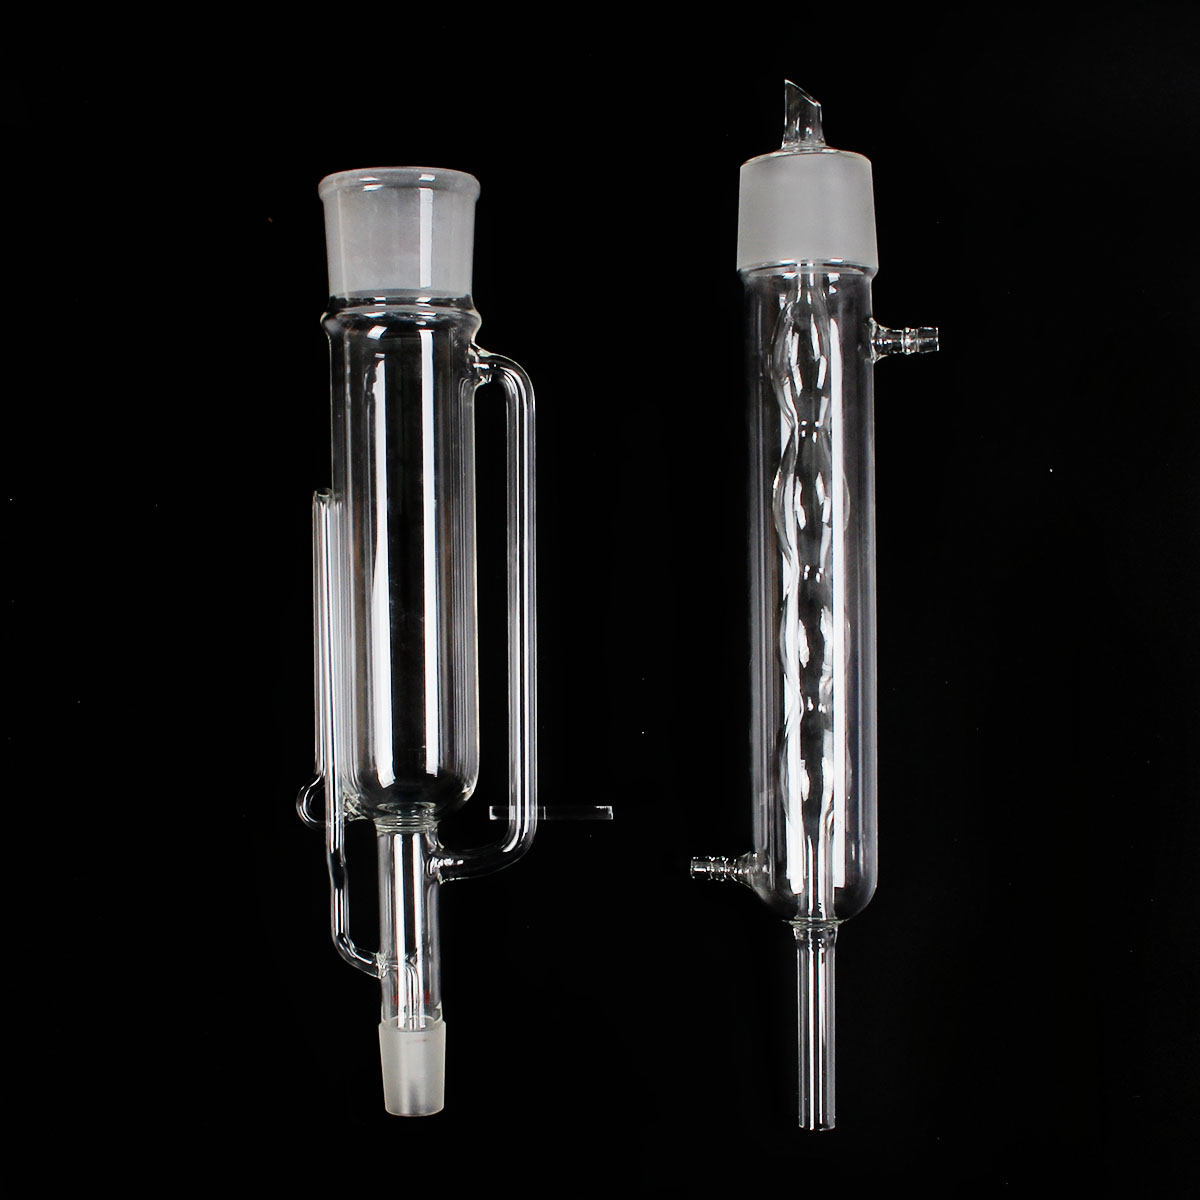 500ml 24/29 Glass Soxhlet Extractor Allihn Condenser Body Glassware Kit Lab Glassware Set Supplies Transparent цена и фото